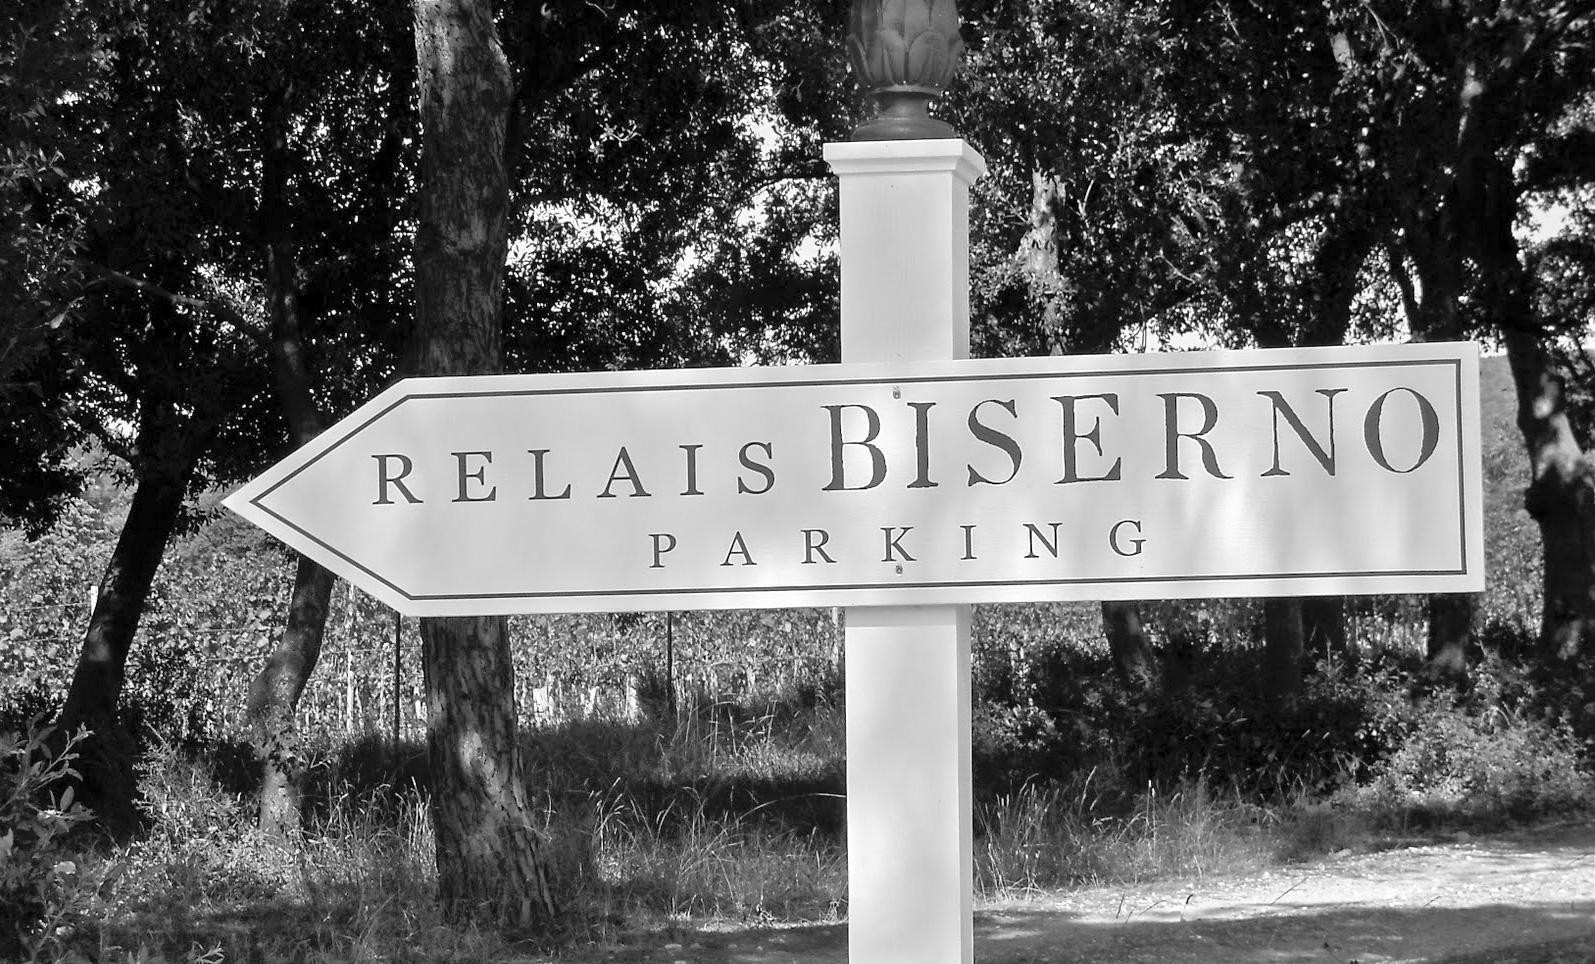 Tenuta di Biserno - Relais sign